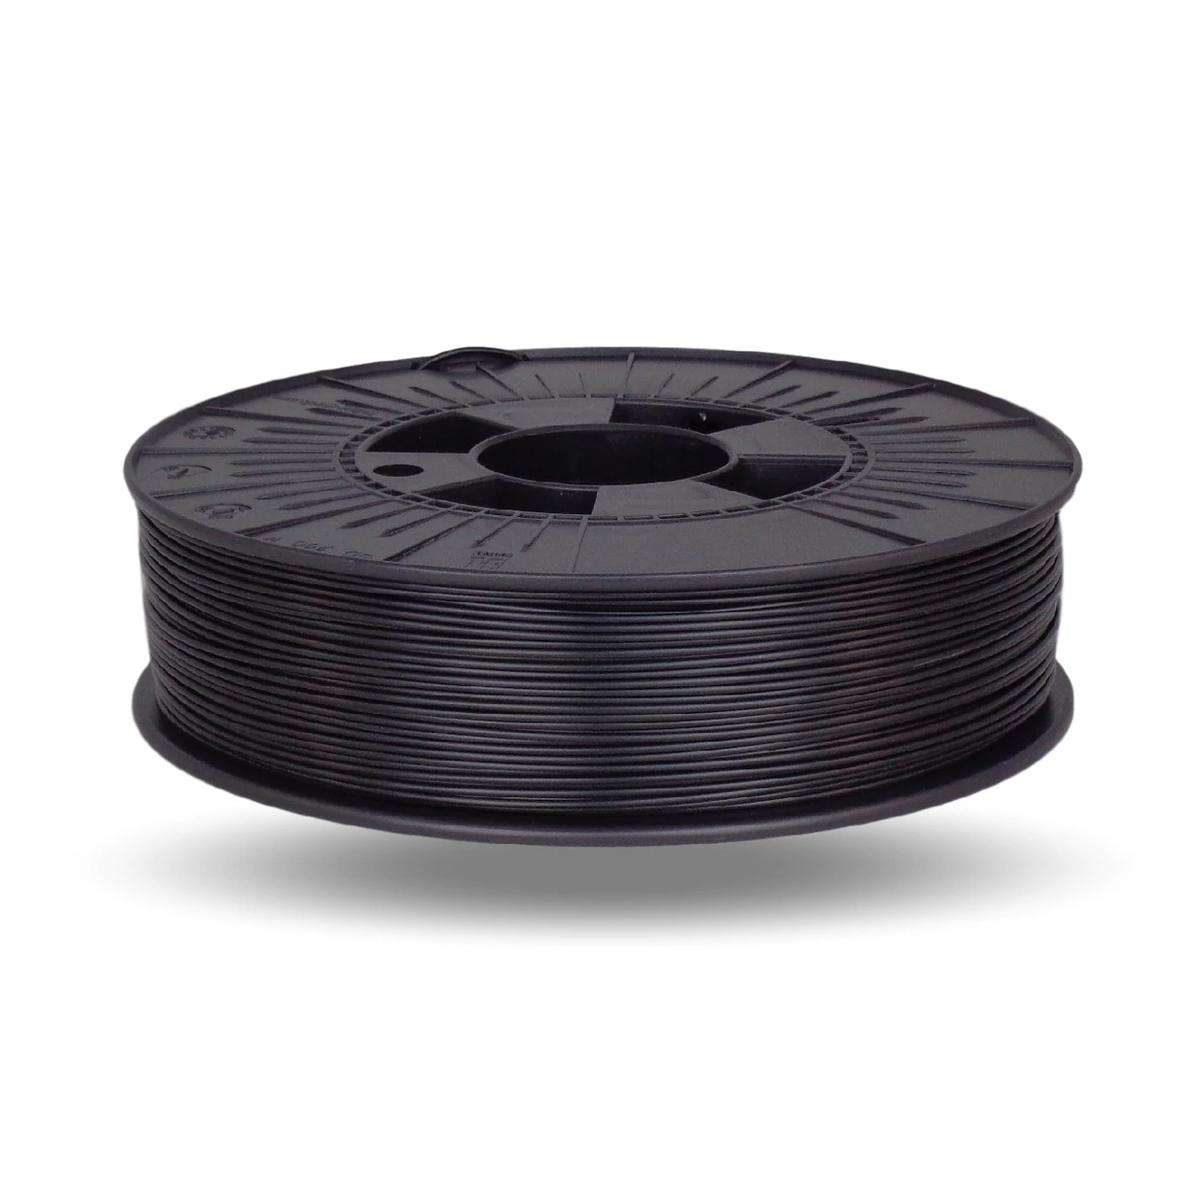 3DXTech PCABS 3D Printing Filament.jpg